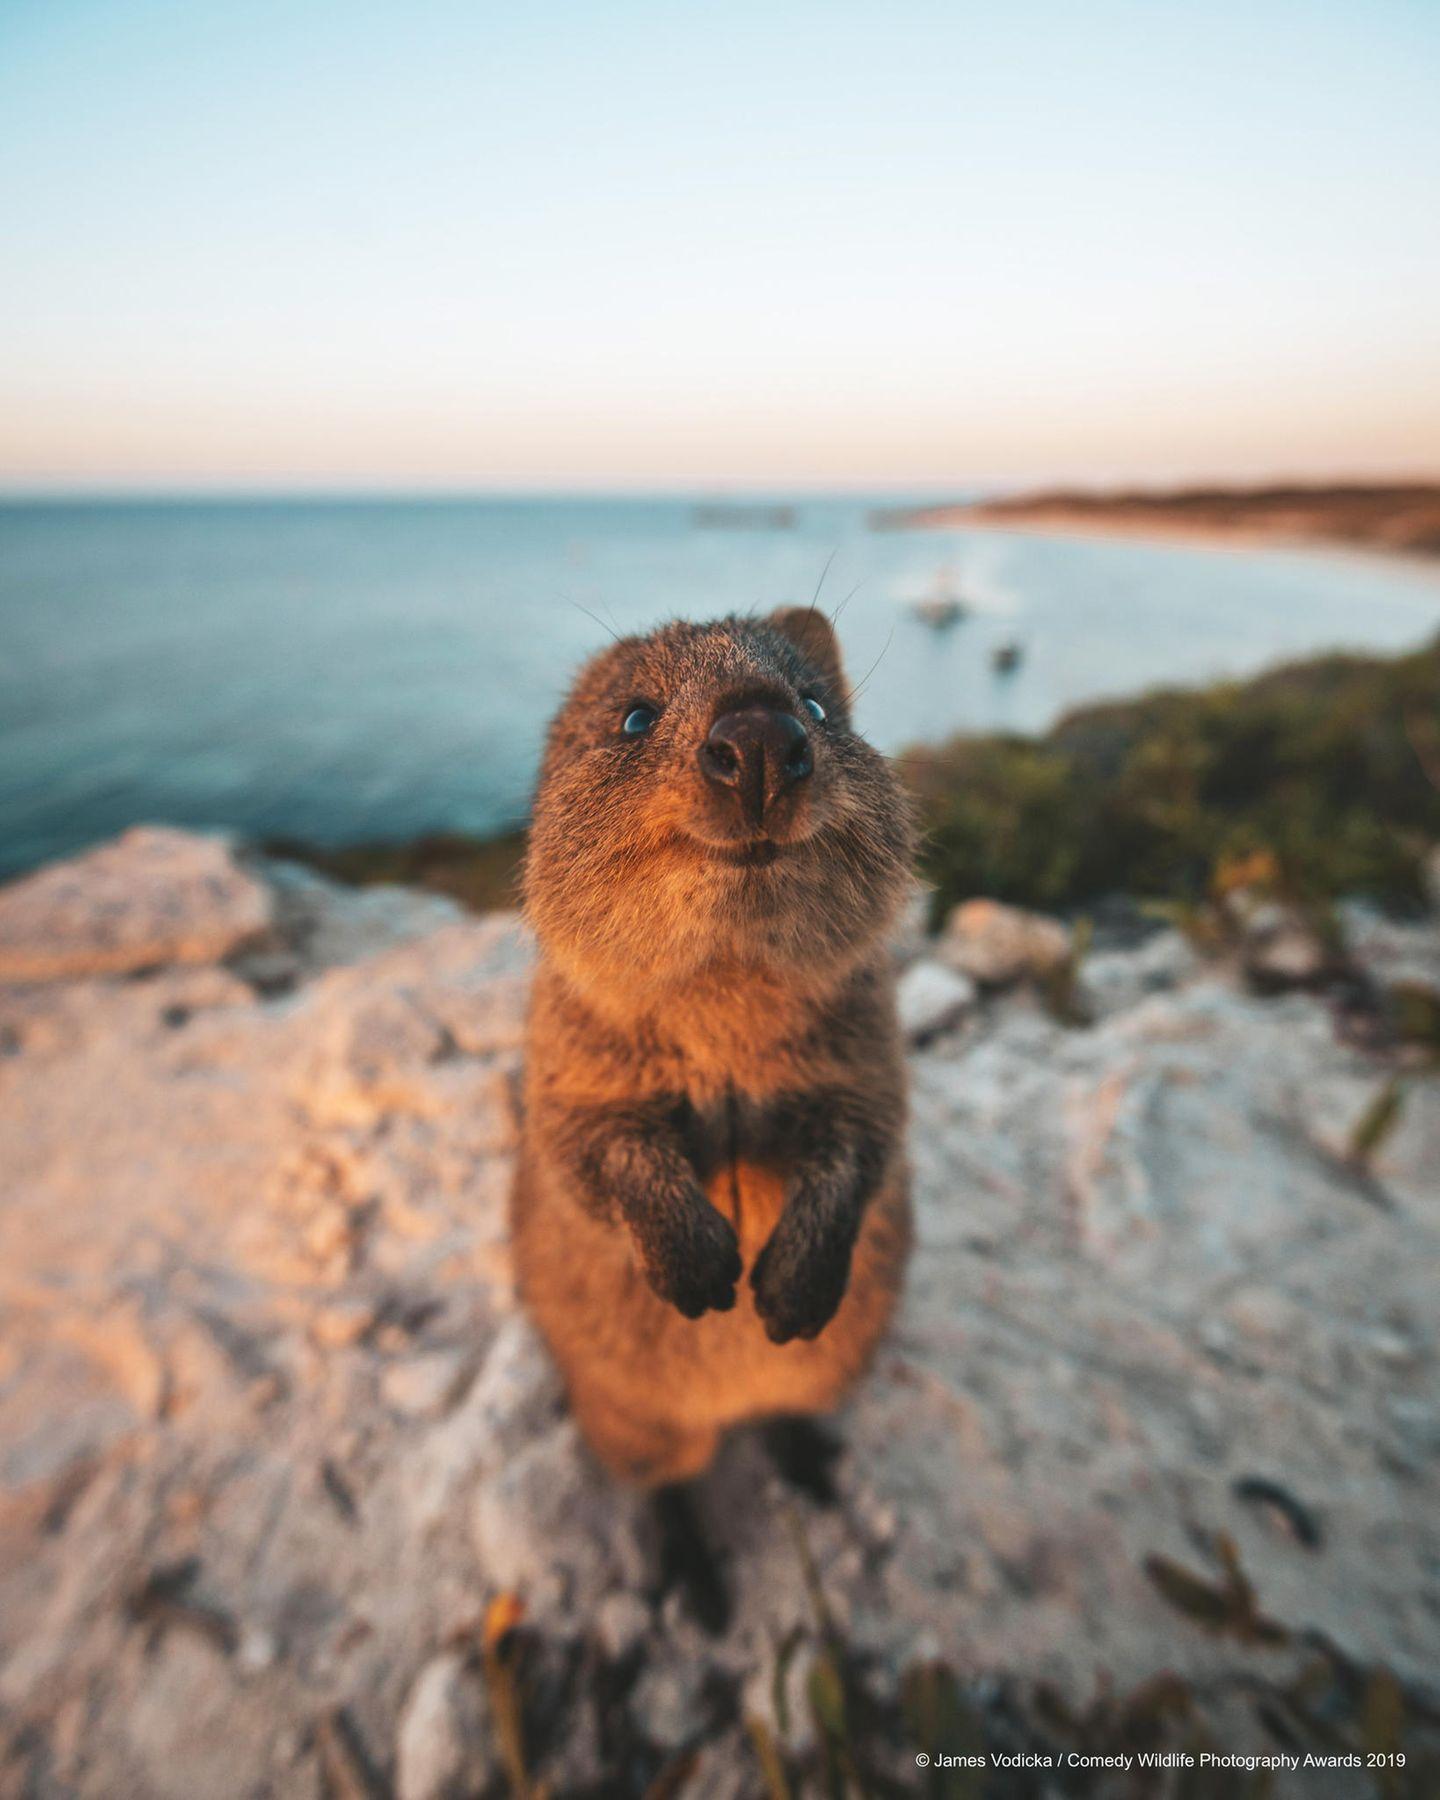 Comedy Wildlife Awards 2019: Quokka schaut in die Kamera